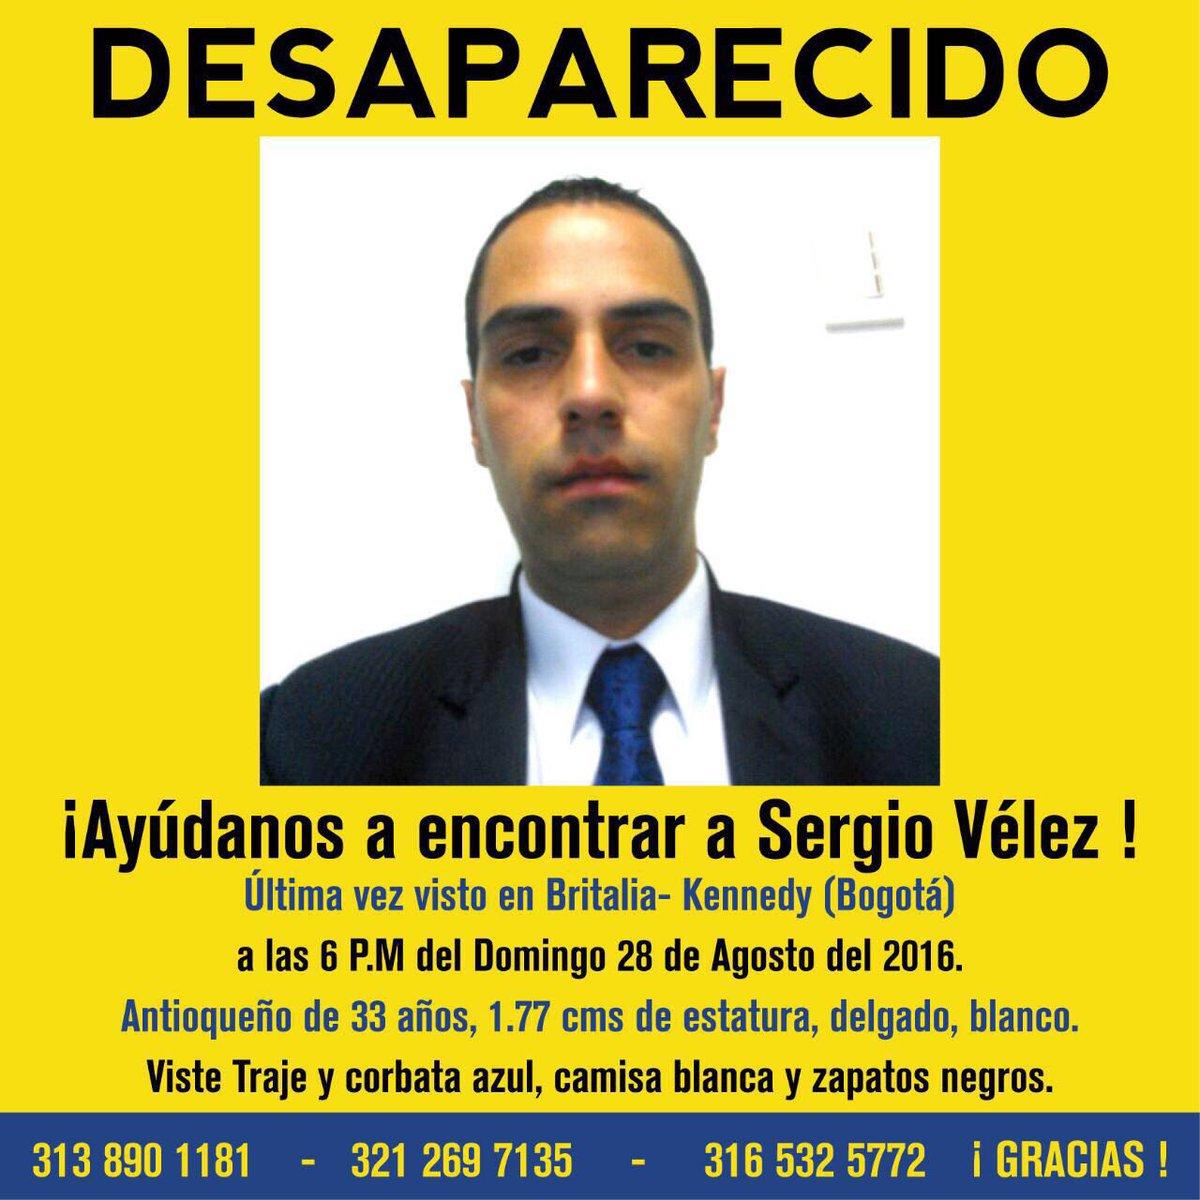 Servicio social. Ayúdenos a encontrar a #SergioVelez. Visto por última vez el domingo barrio Britalia, loc Kennedy https://t.co/Ldtc4XT4zn